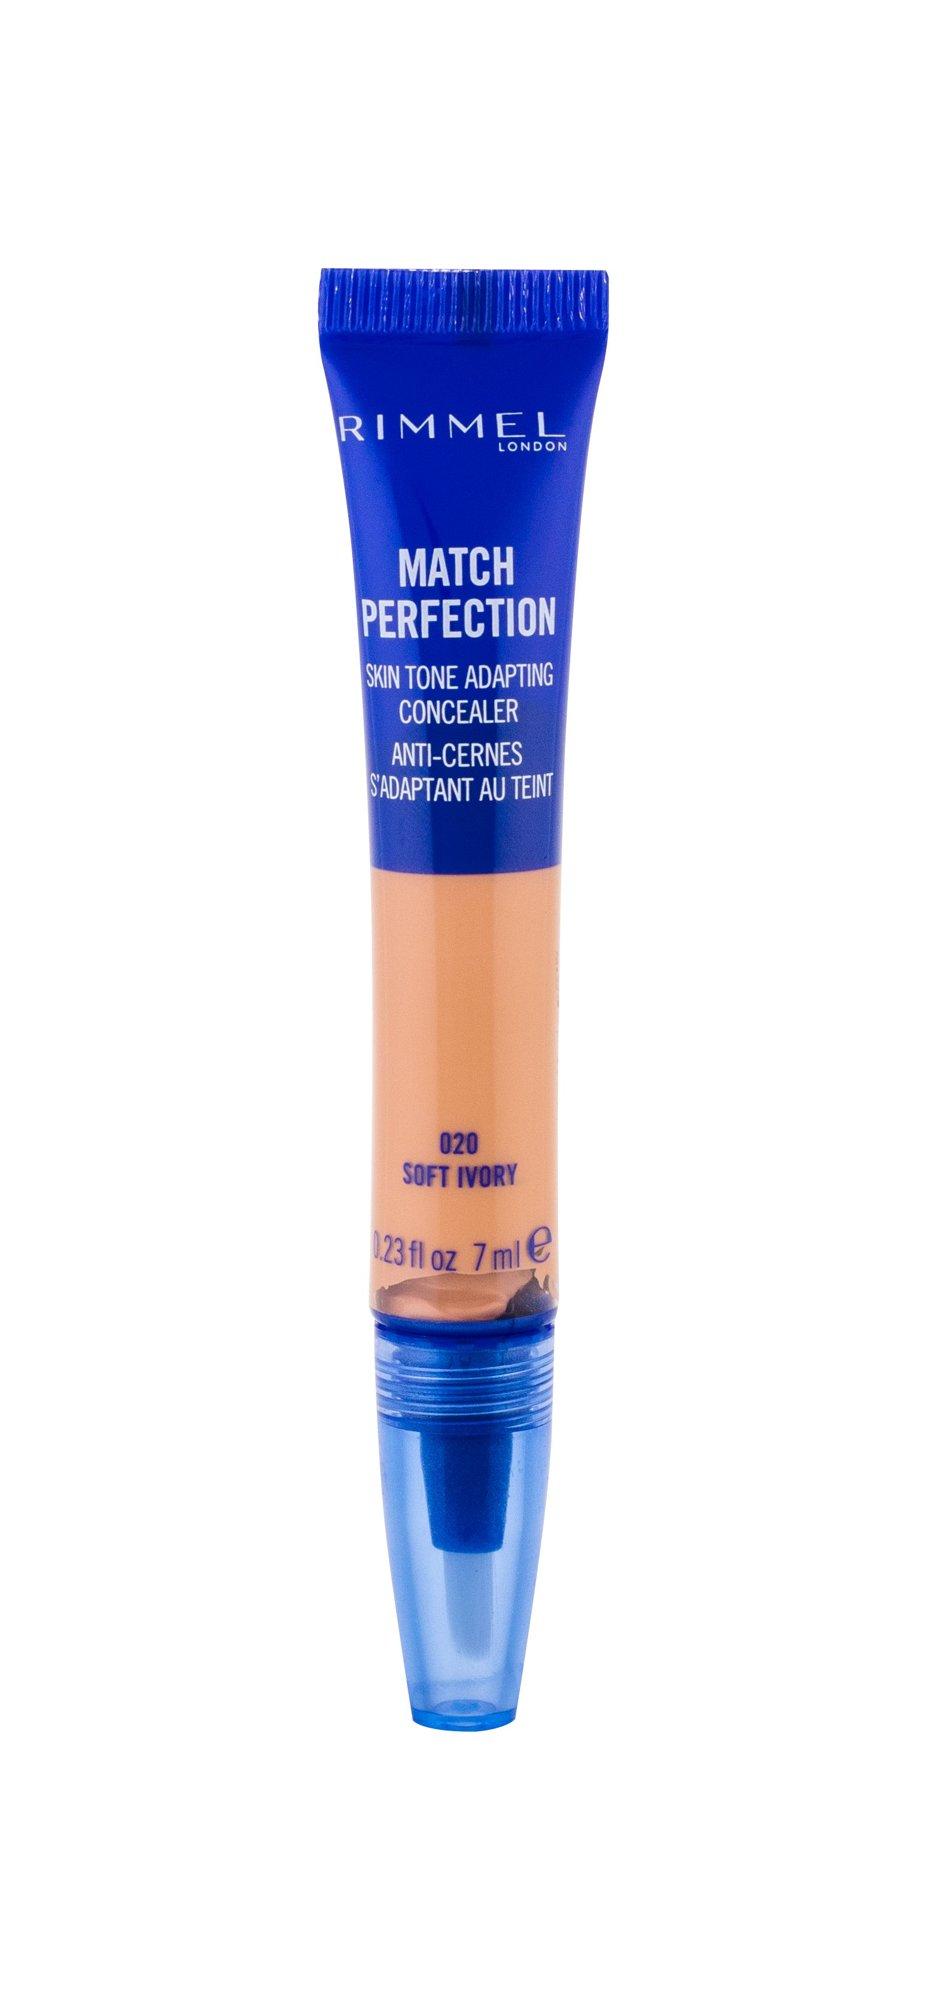 Rimmel London Match Perfection Corrector 7ml 020 Soft Ivory